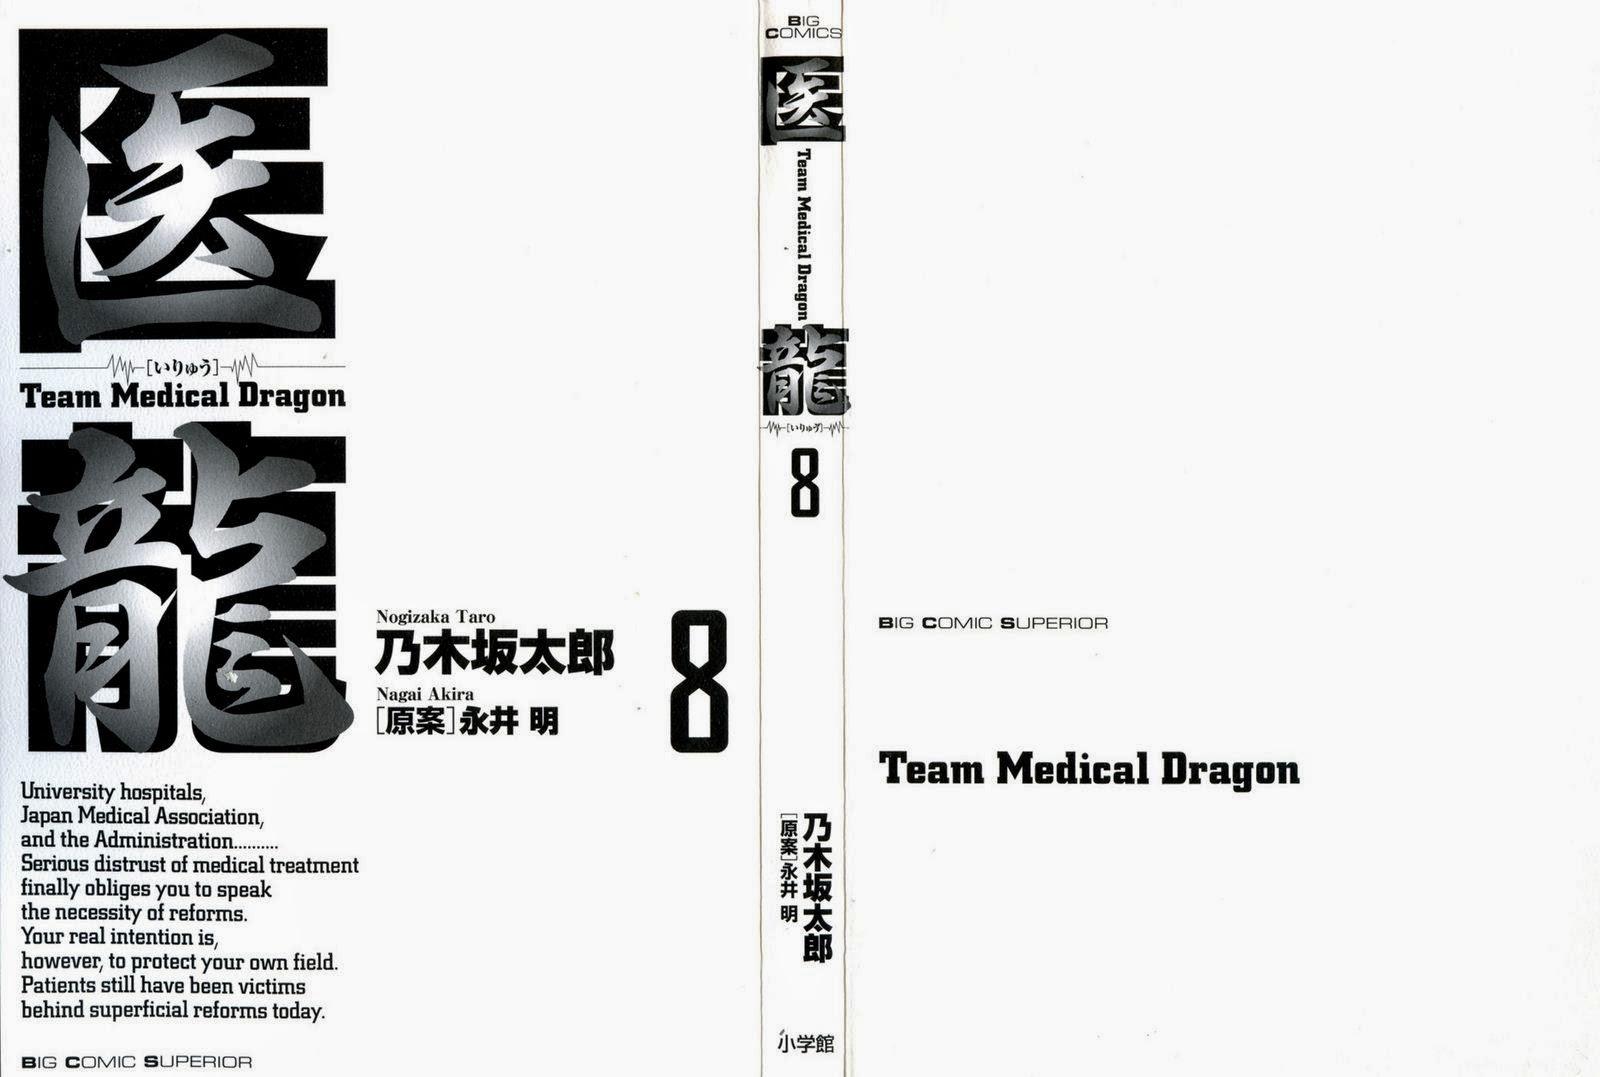 Team Medical Dragon - Long Tinh Y Đội